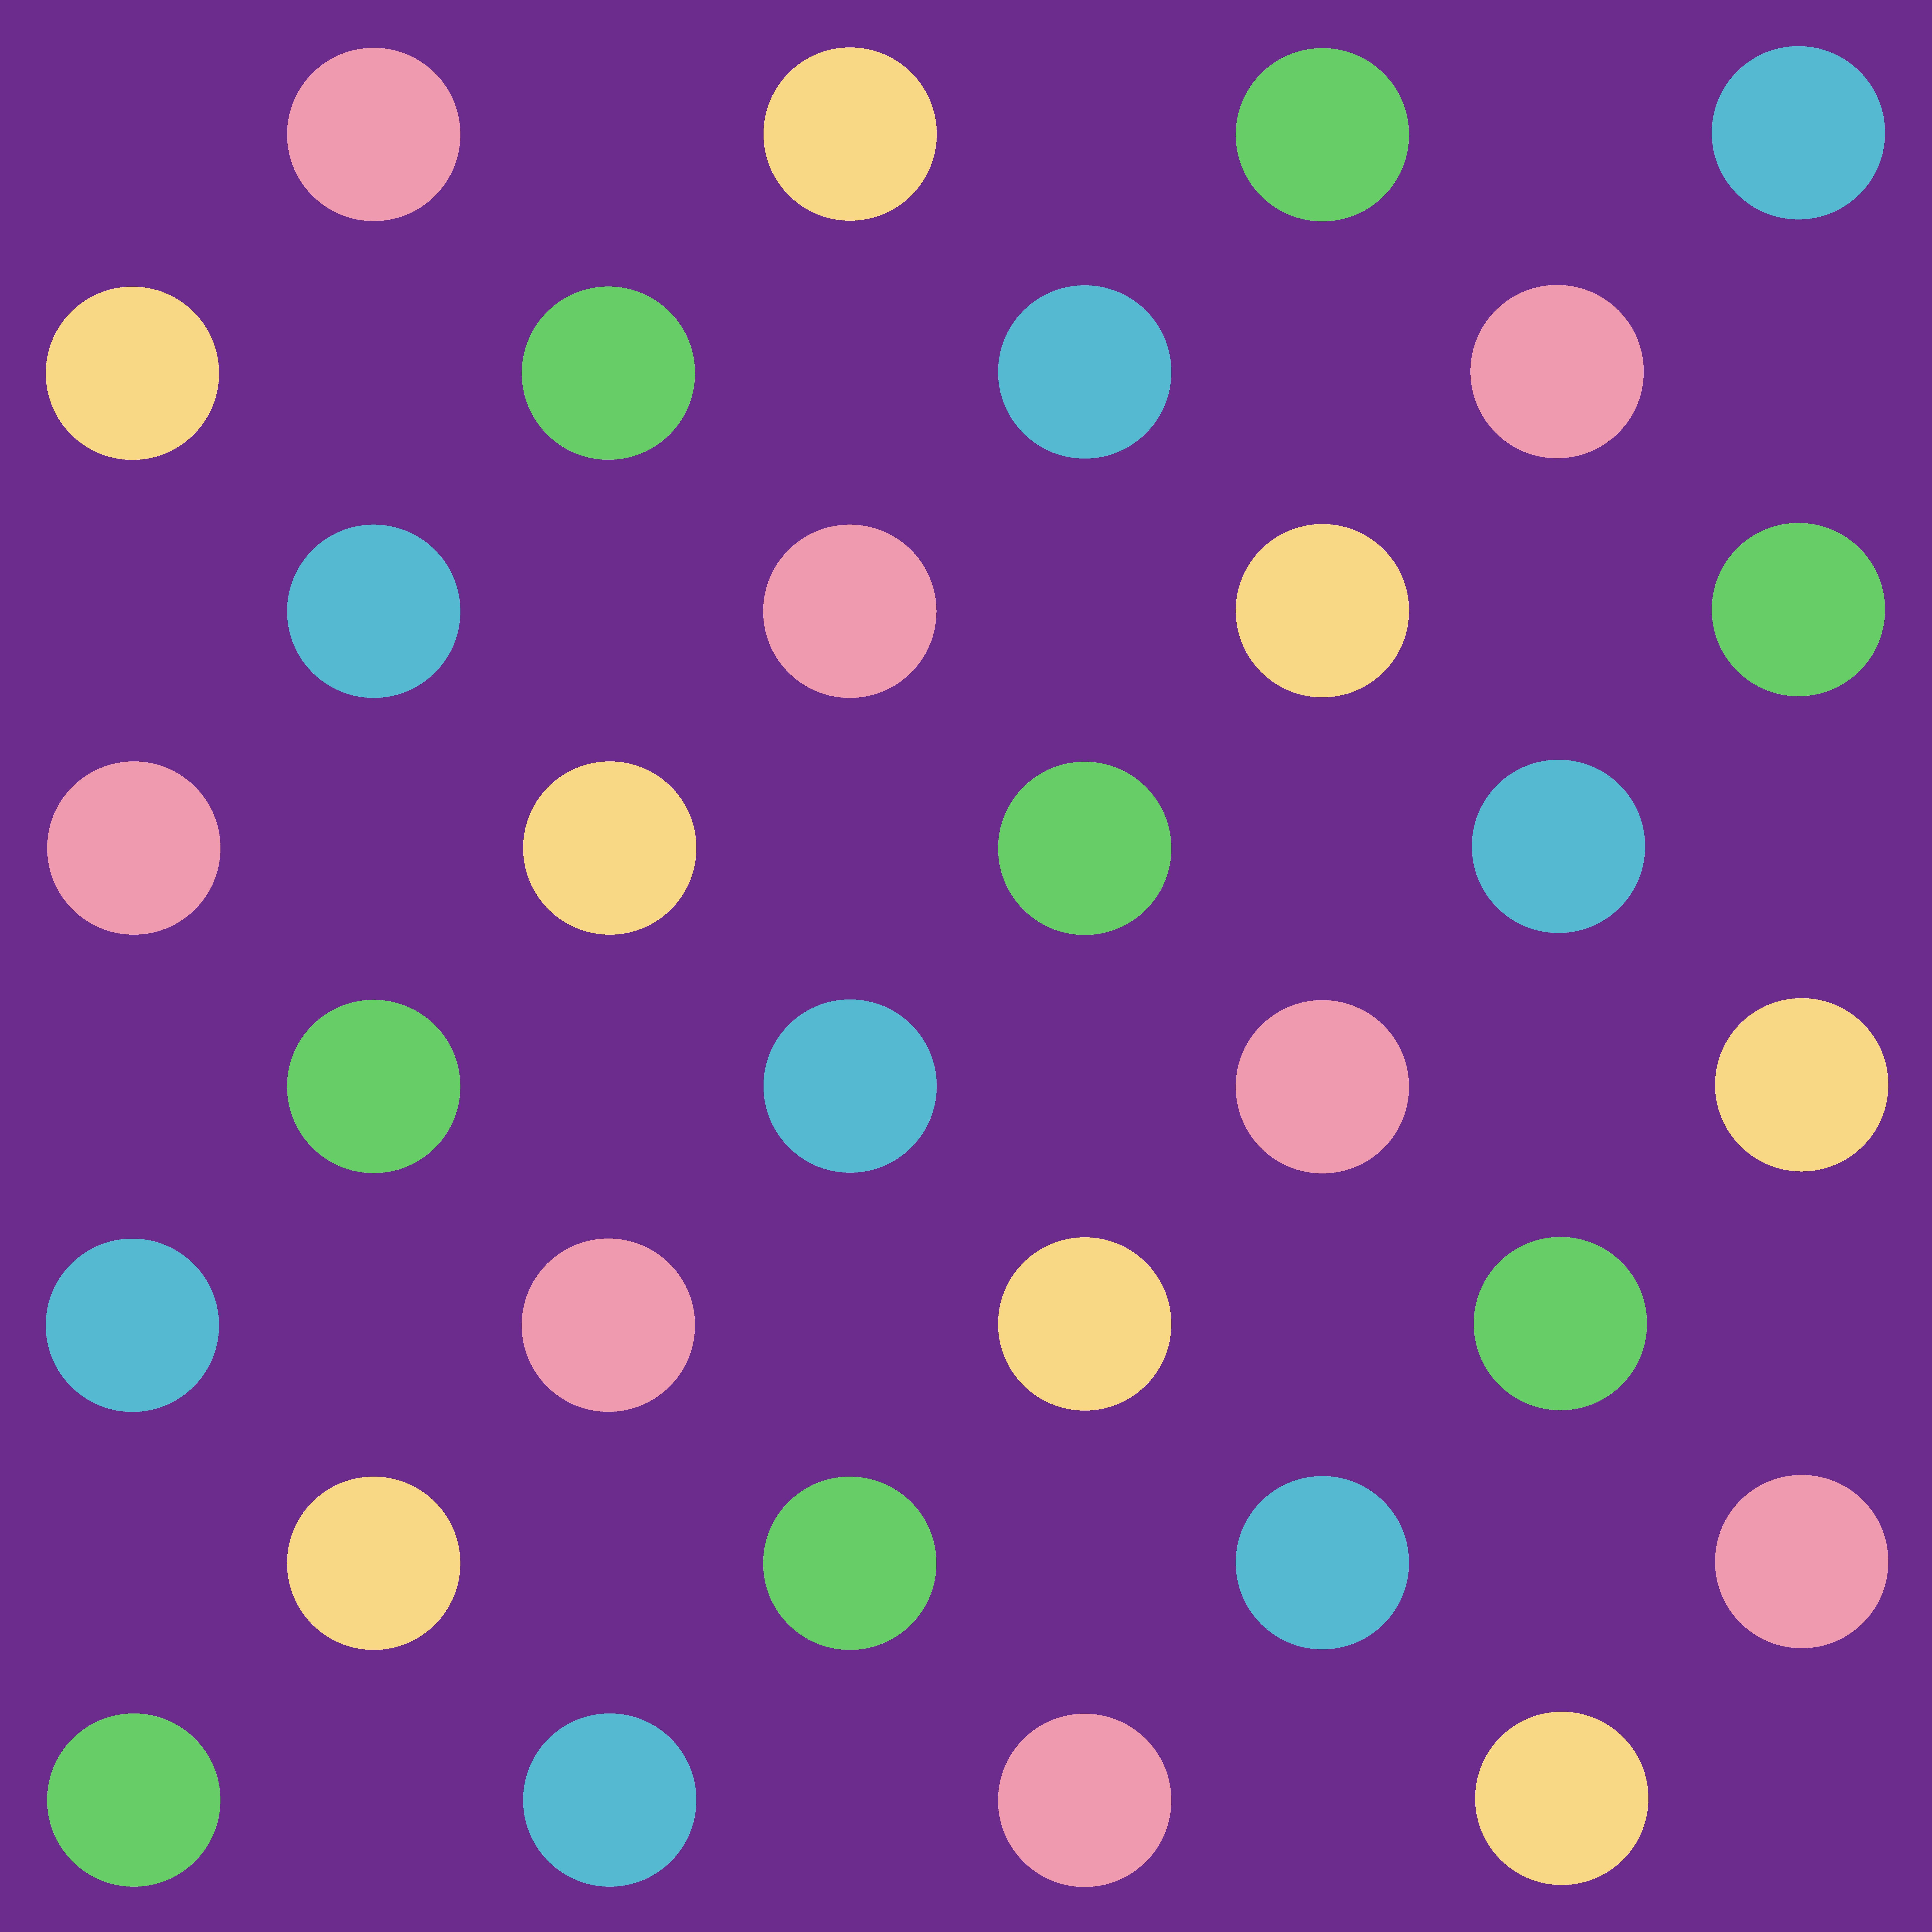 Pattern clipart polka dot Clip Dot Rainbow Clip Art